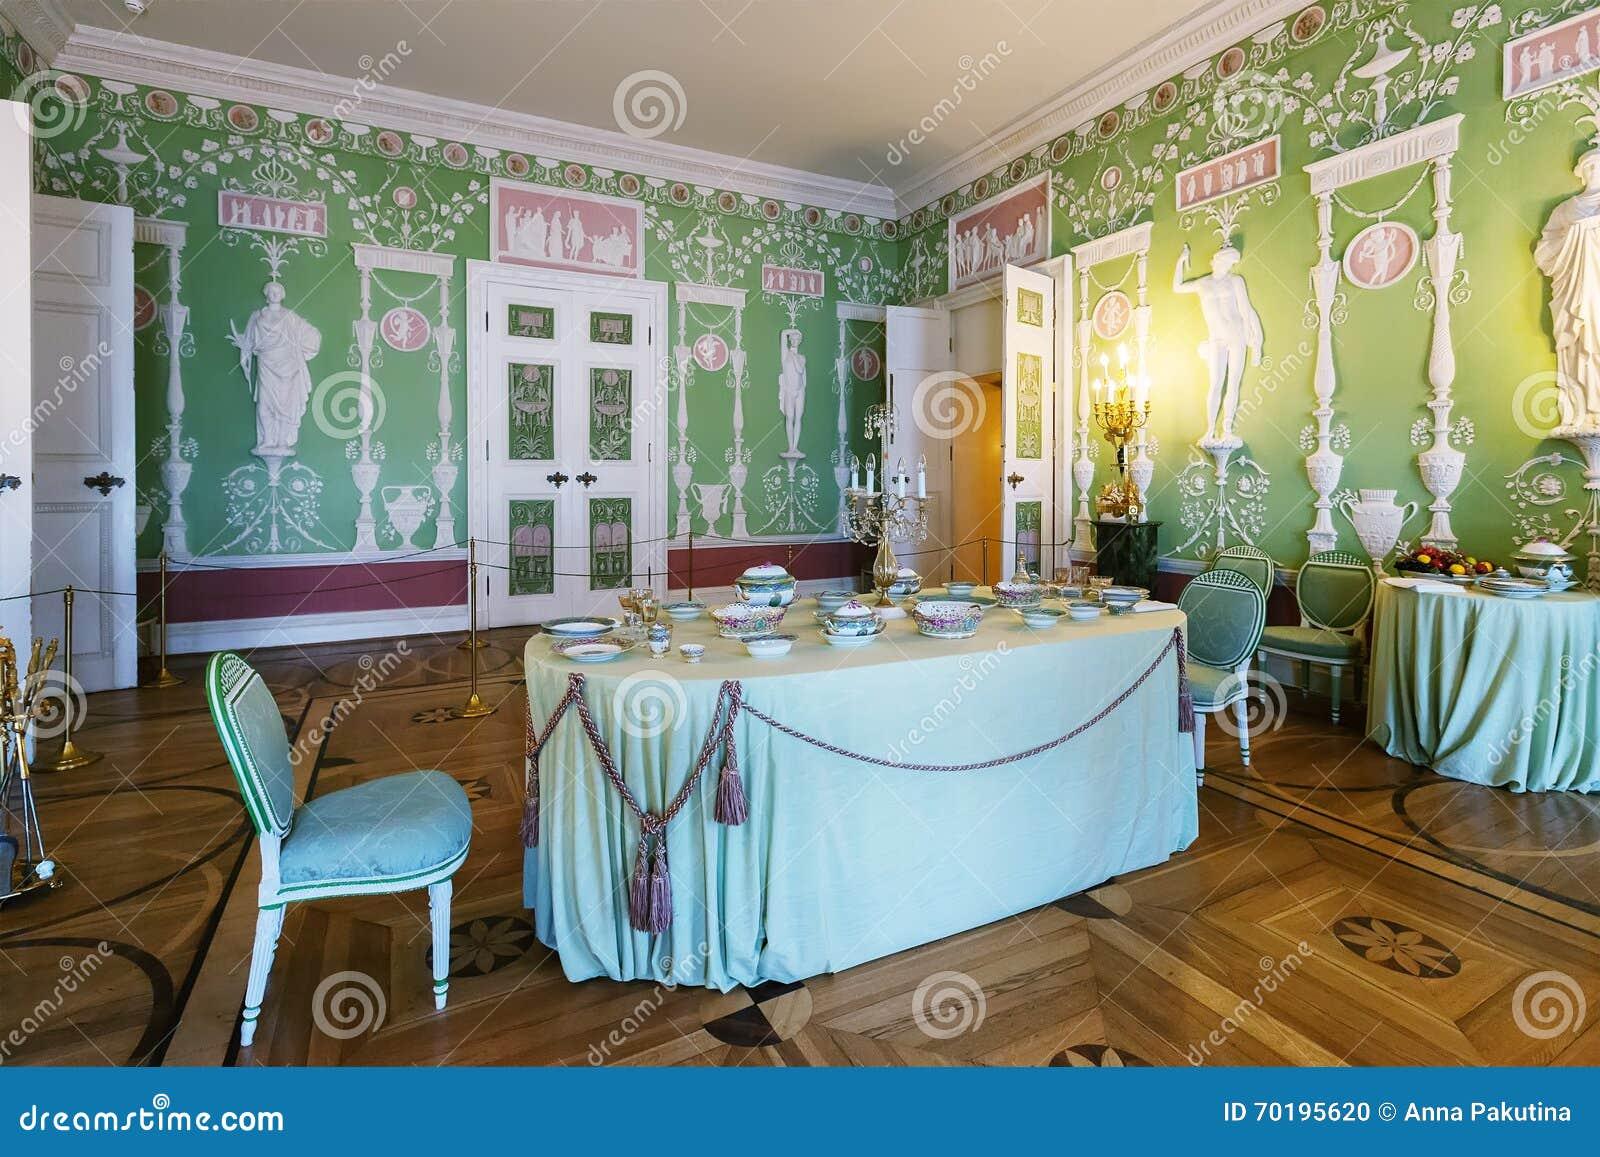 Inre av Catherine Palace i Tsarskoye Selo (Pushkin), St